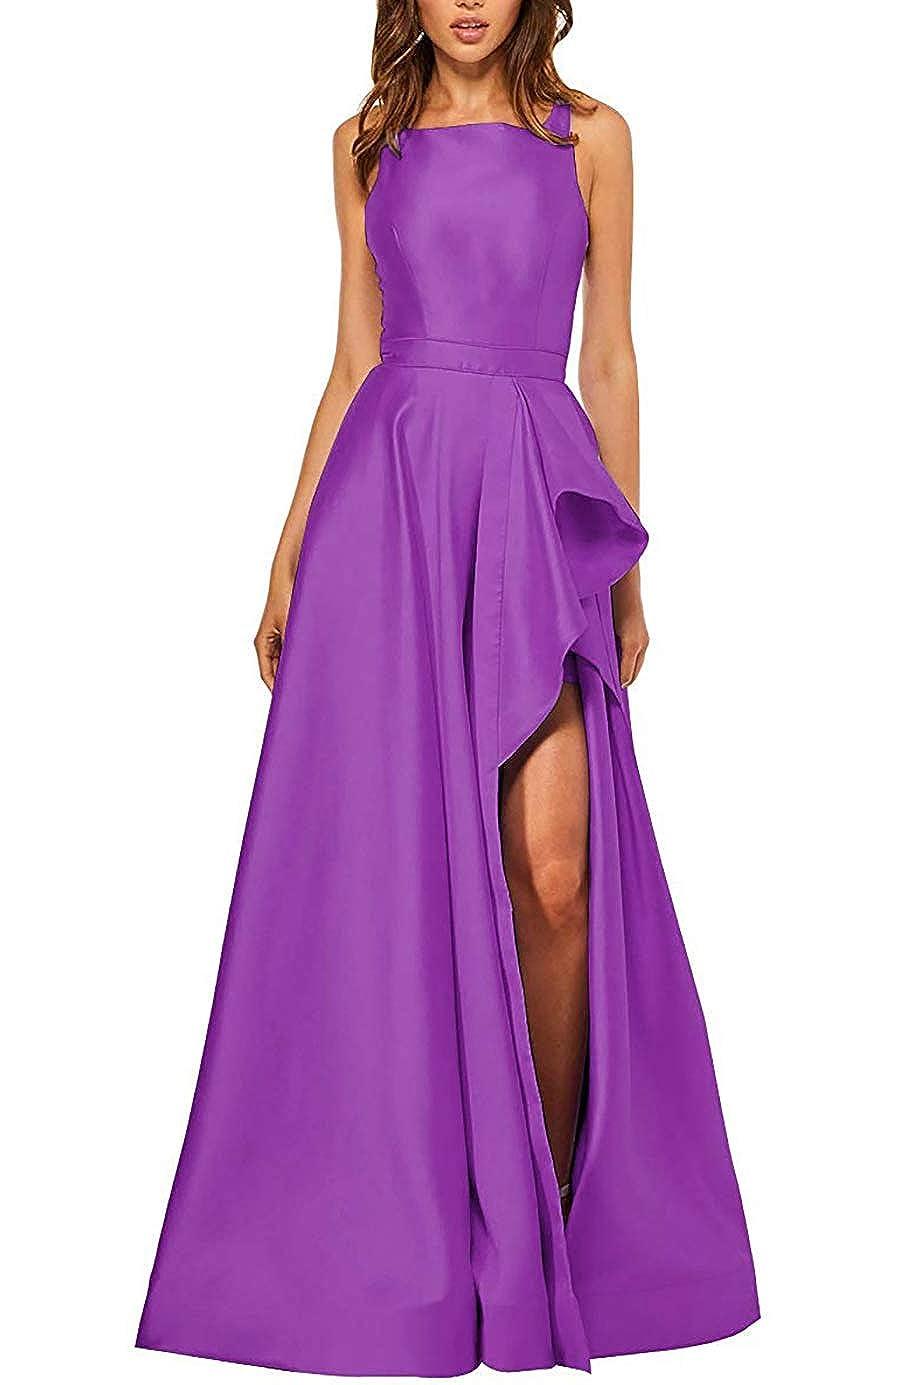 Dahlia PrettyTatum Women's Backless Long Prom Dresses Formal Evening Ball Gowns with Split Pockets